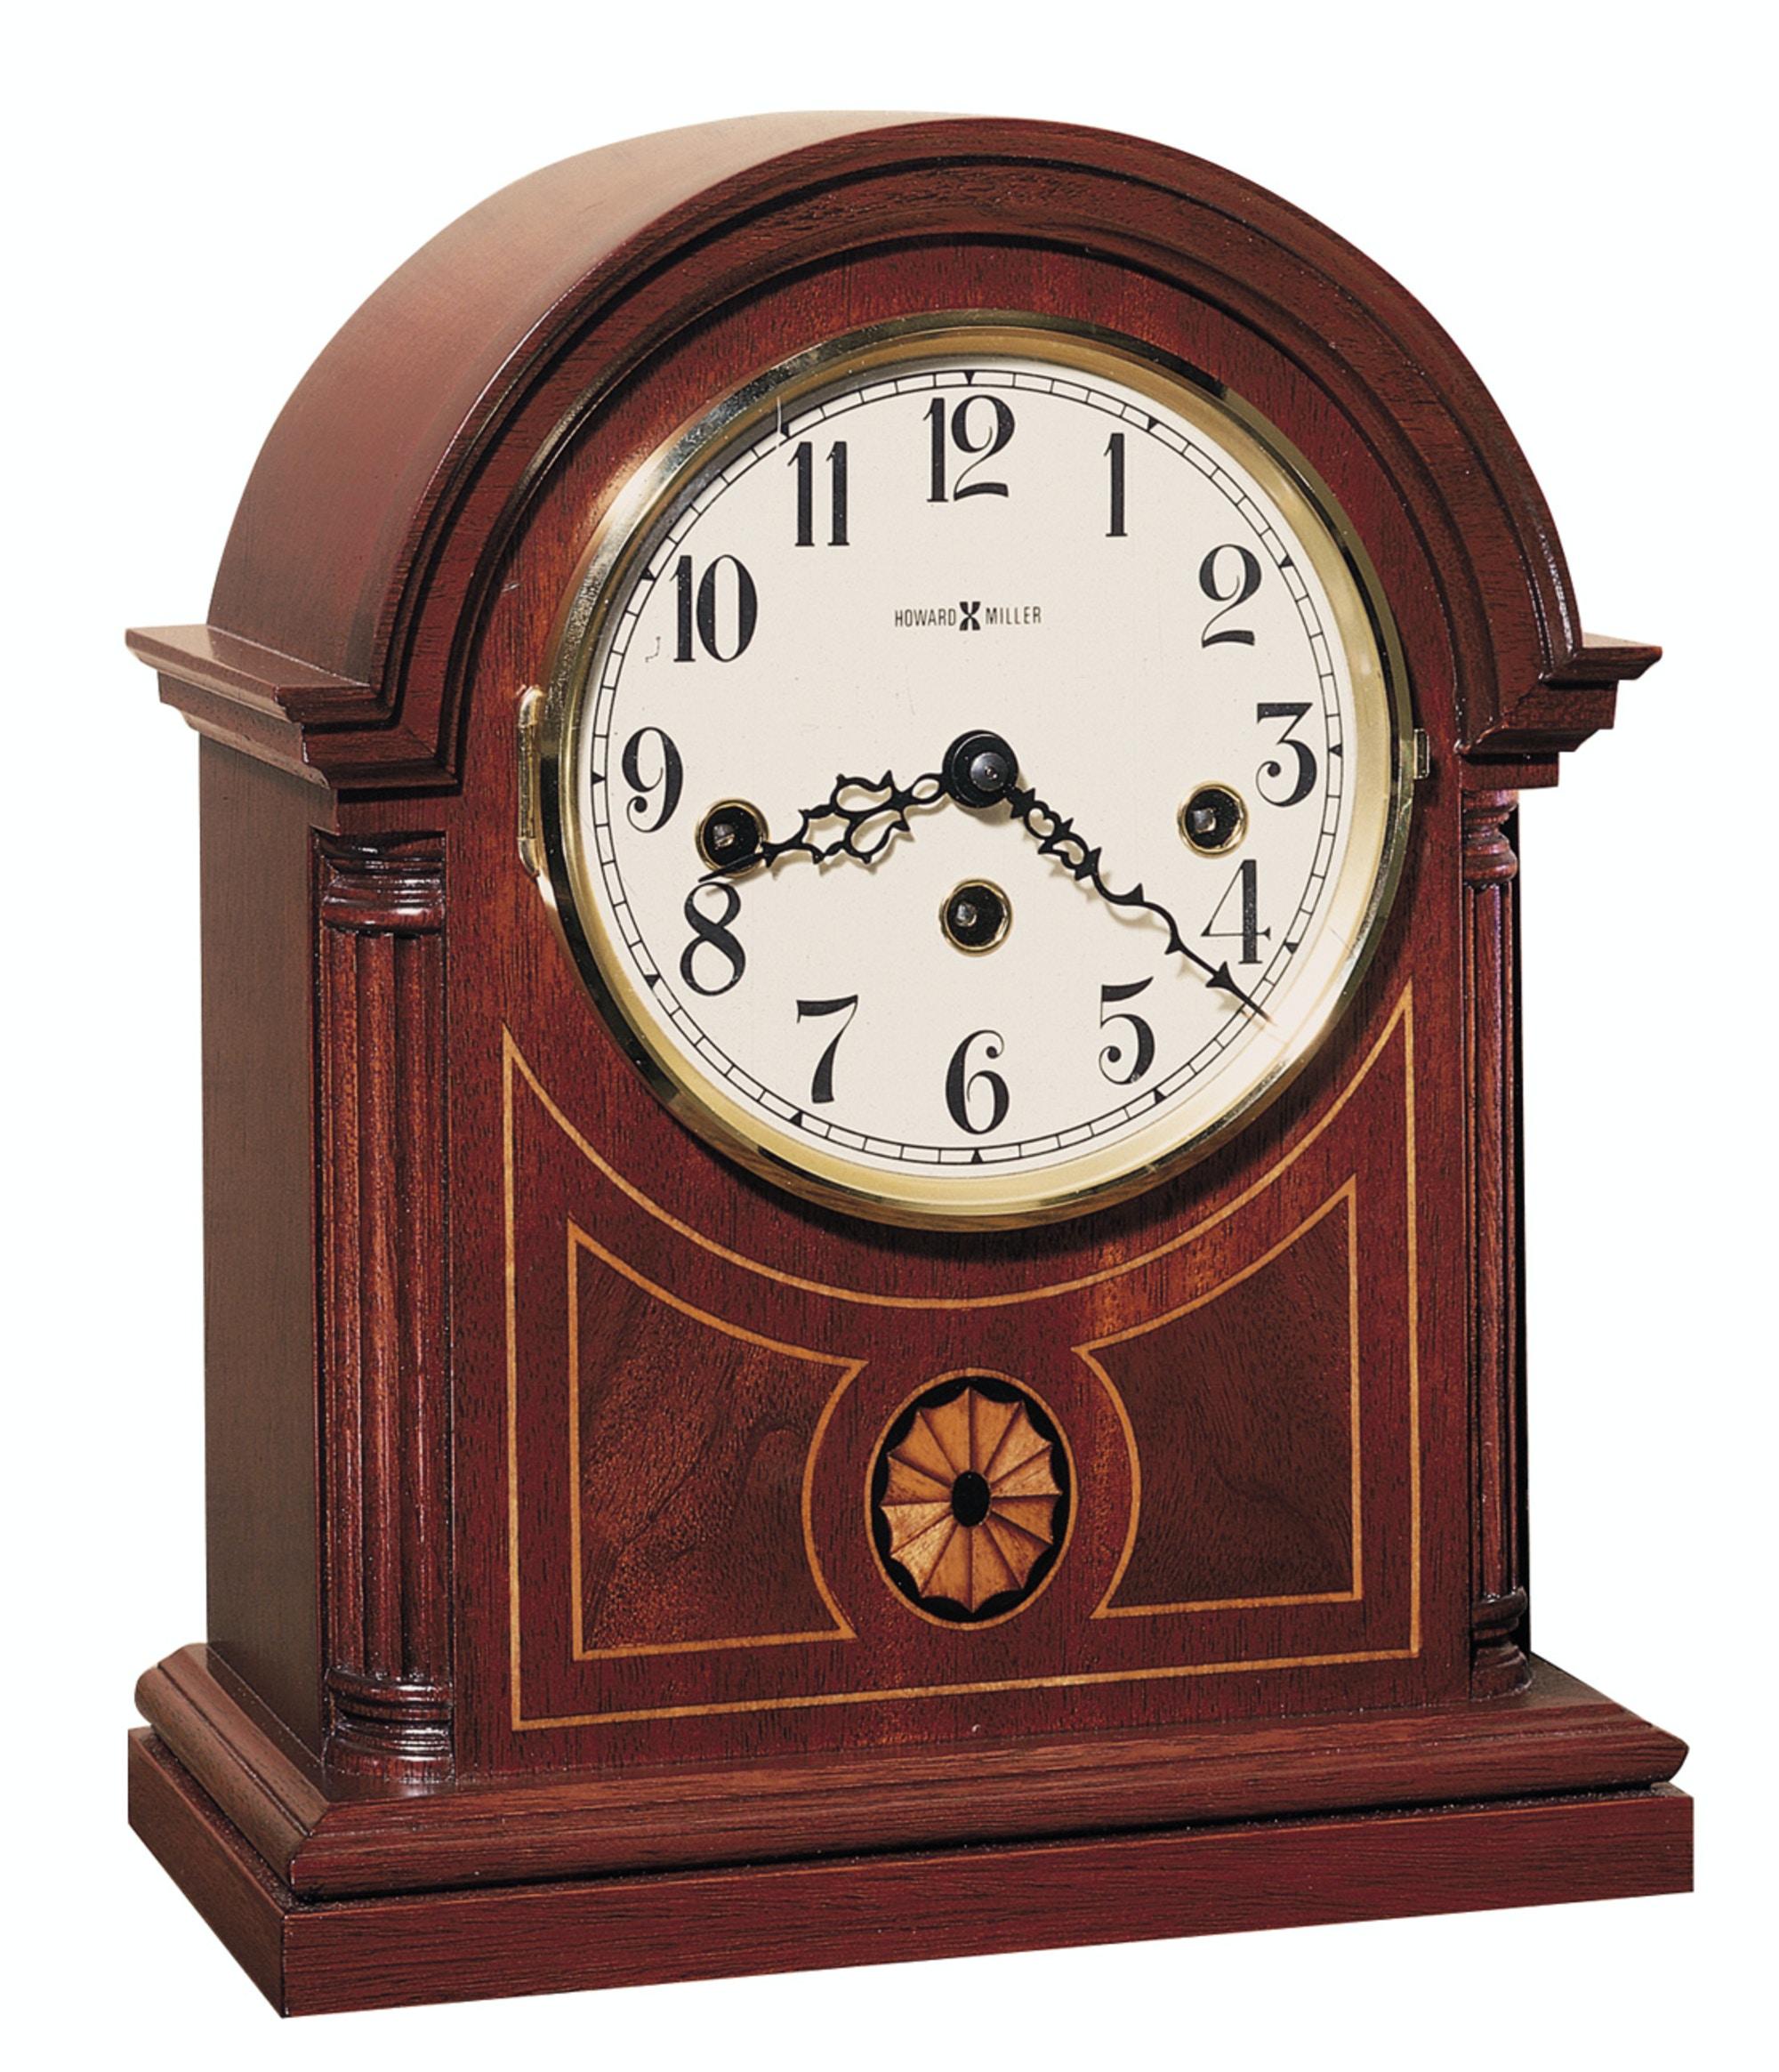 Howard miller mantel clock service